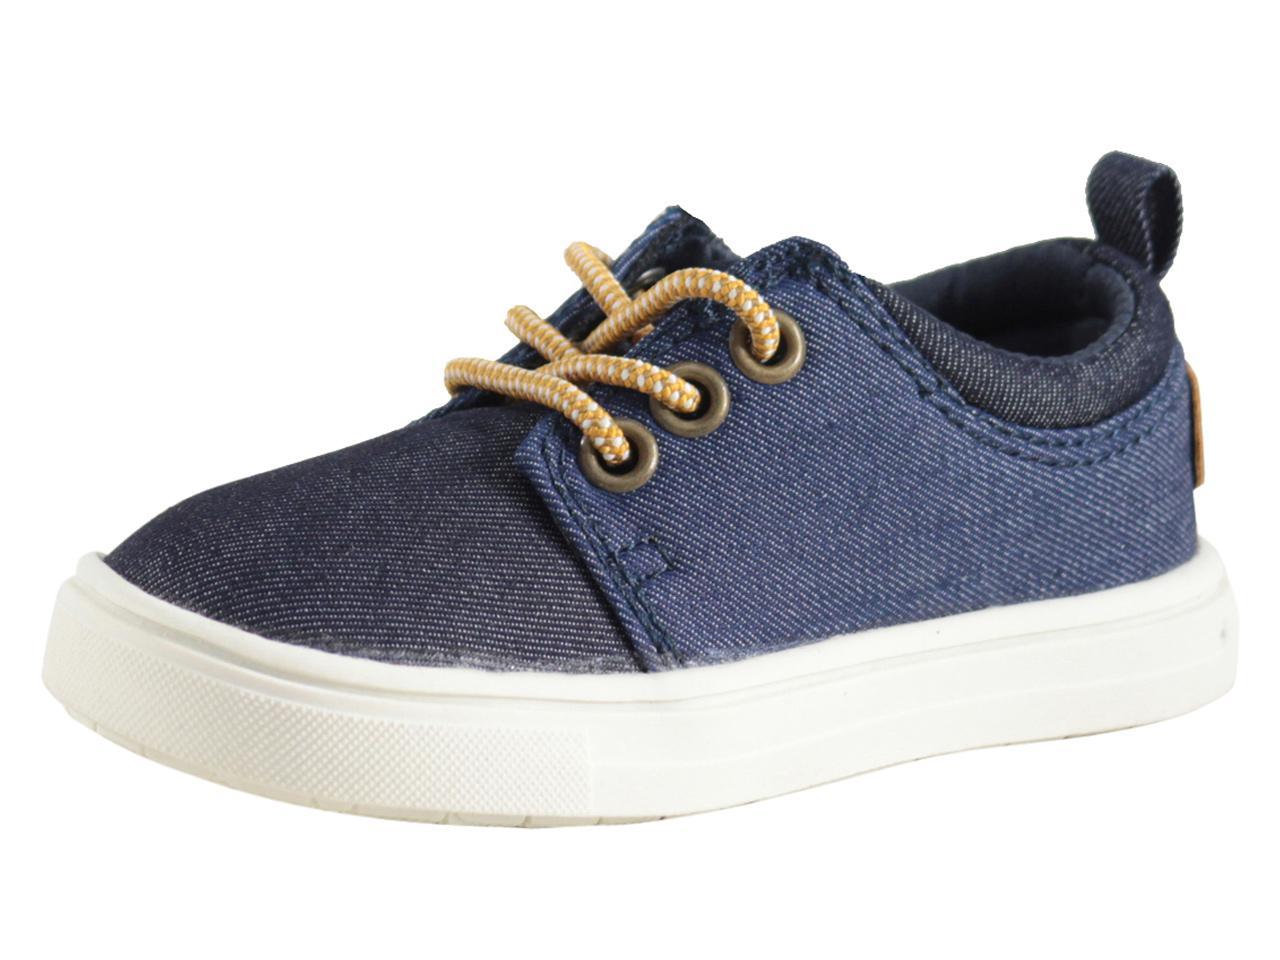 ce9948da9871aa Carter s Toddler Little Boy s Limeri2 Sneakers Shoes